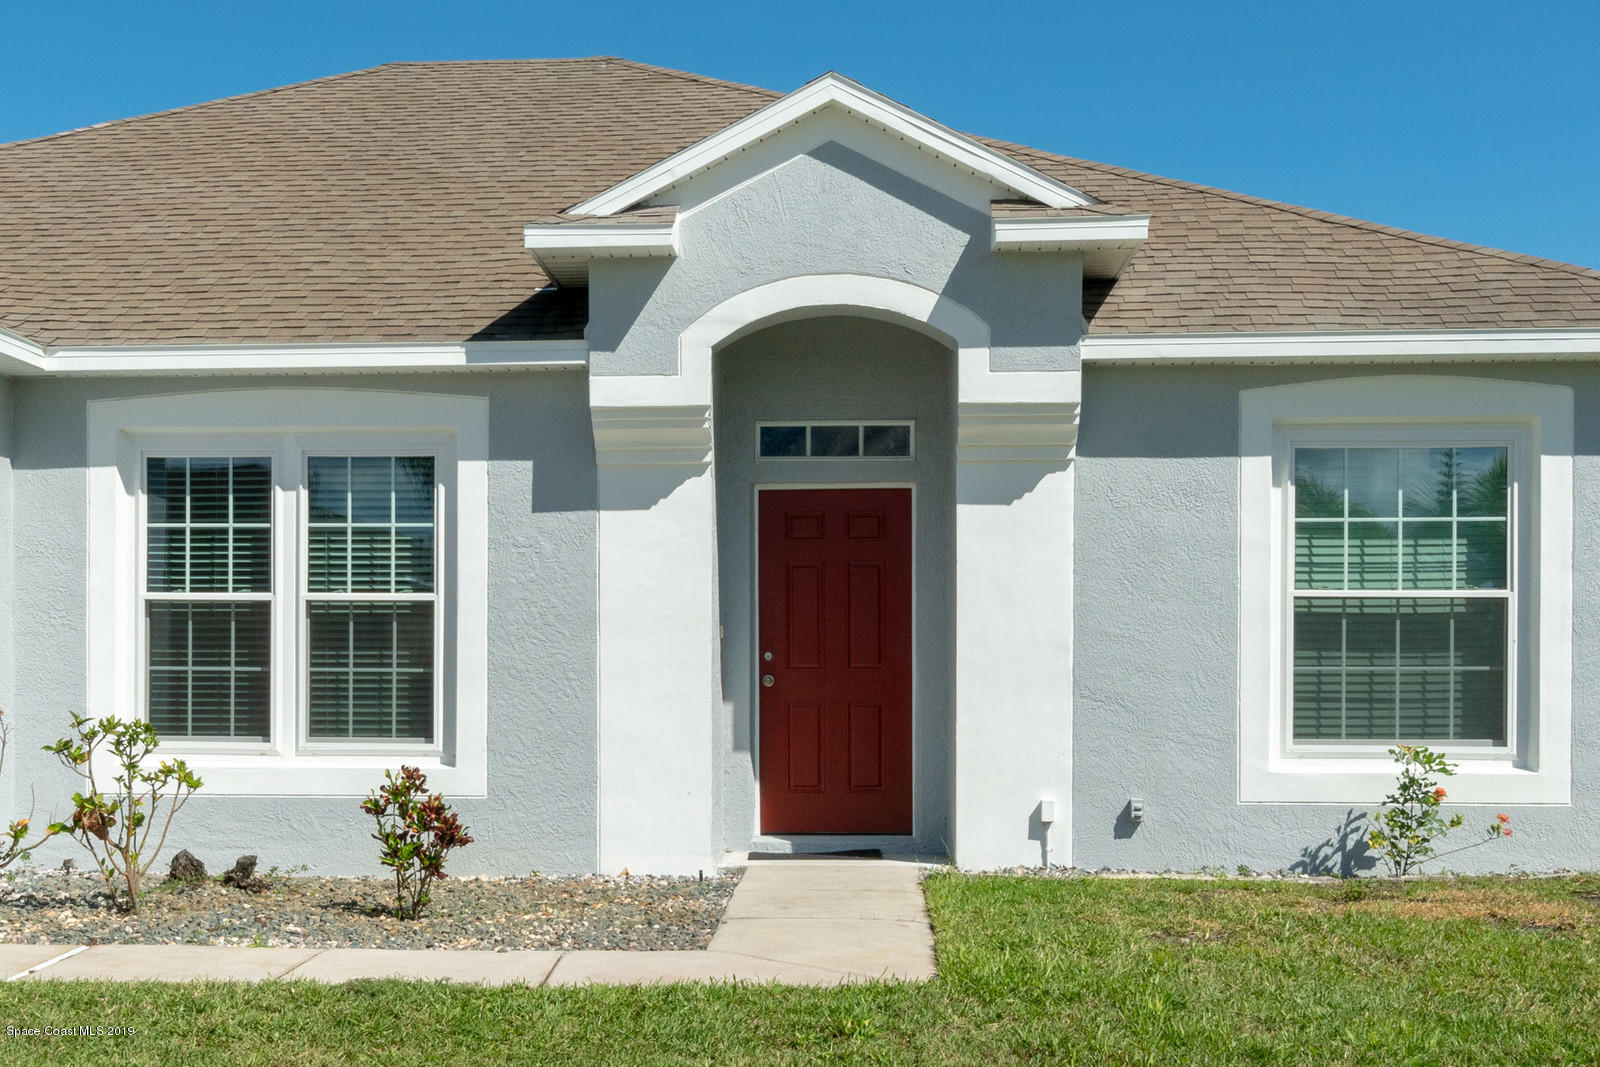 Single Family Home for Sale at 4040 Caparosa 4040 Caparosa Melbourne, Florida 32940 United States